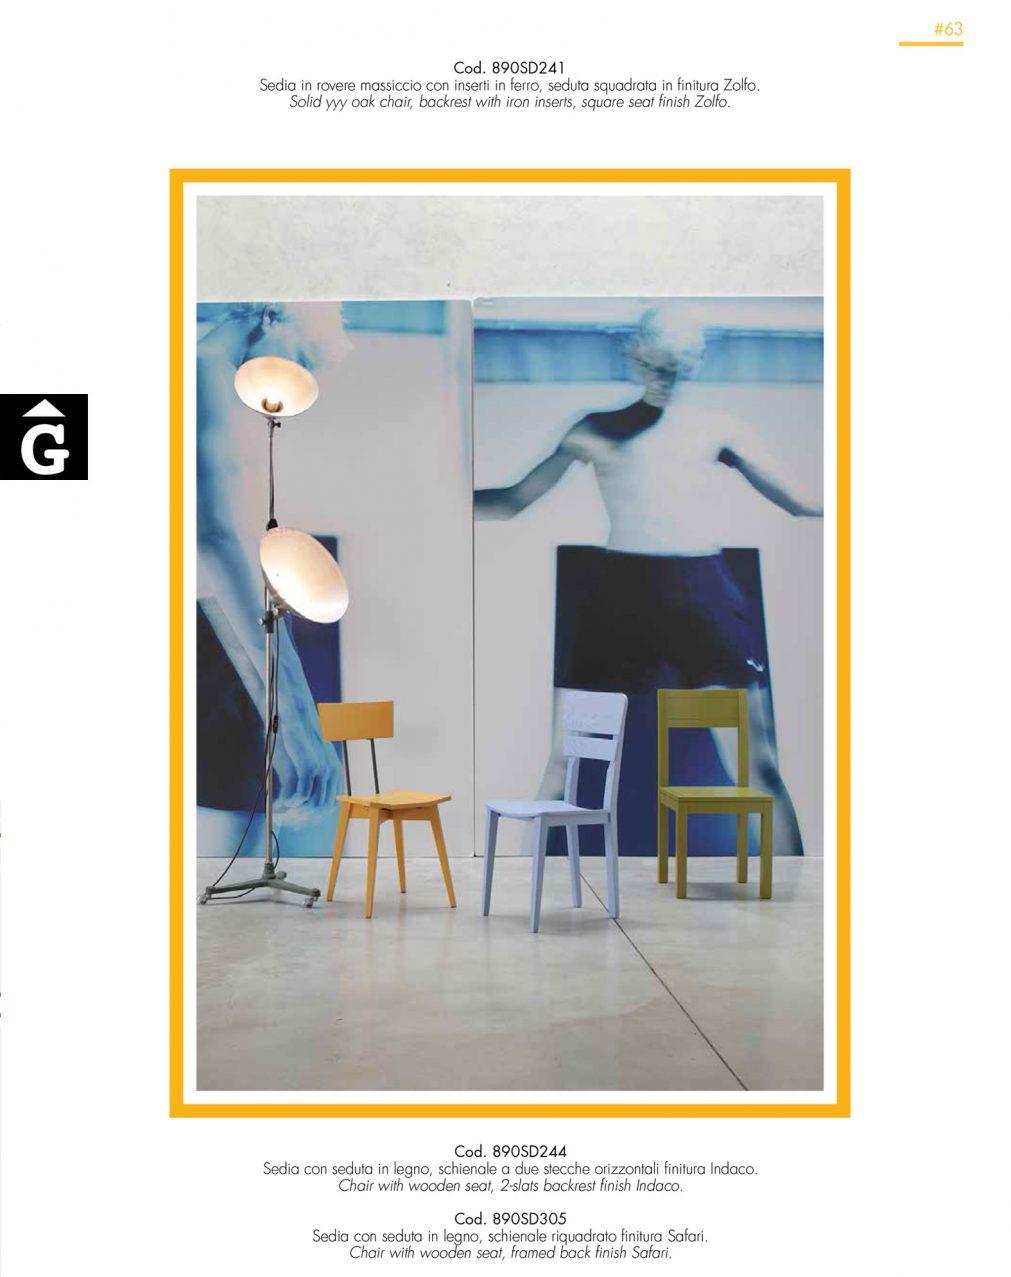 Cadires 32-1-V-Taules-massisses-a-mida-experience-Mobles-Gifreu-&-Devina-Nais-collection-M15_catalogue-3